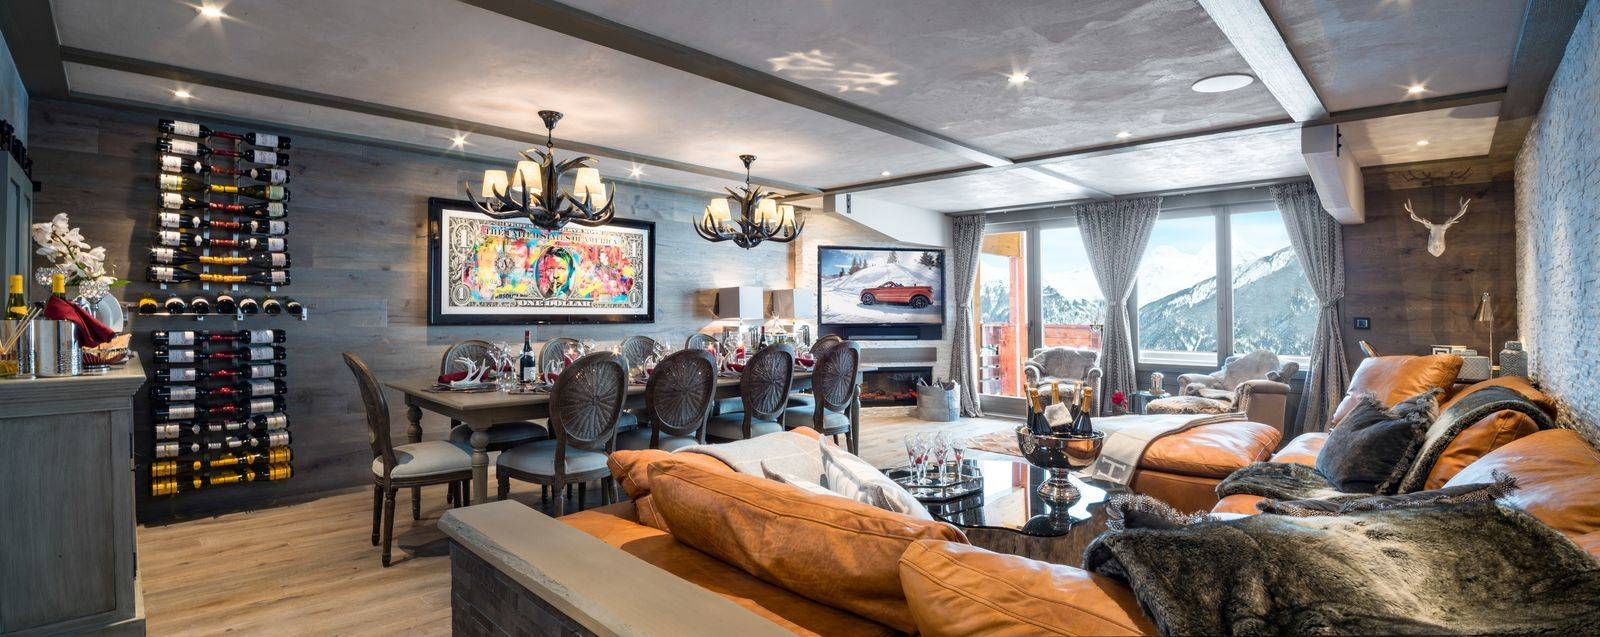 appartement-sweet-escape-diningroom_2